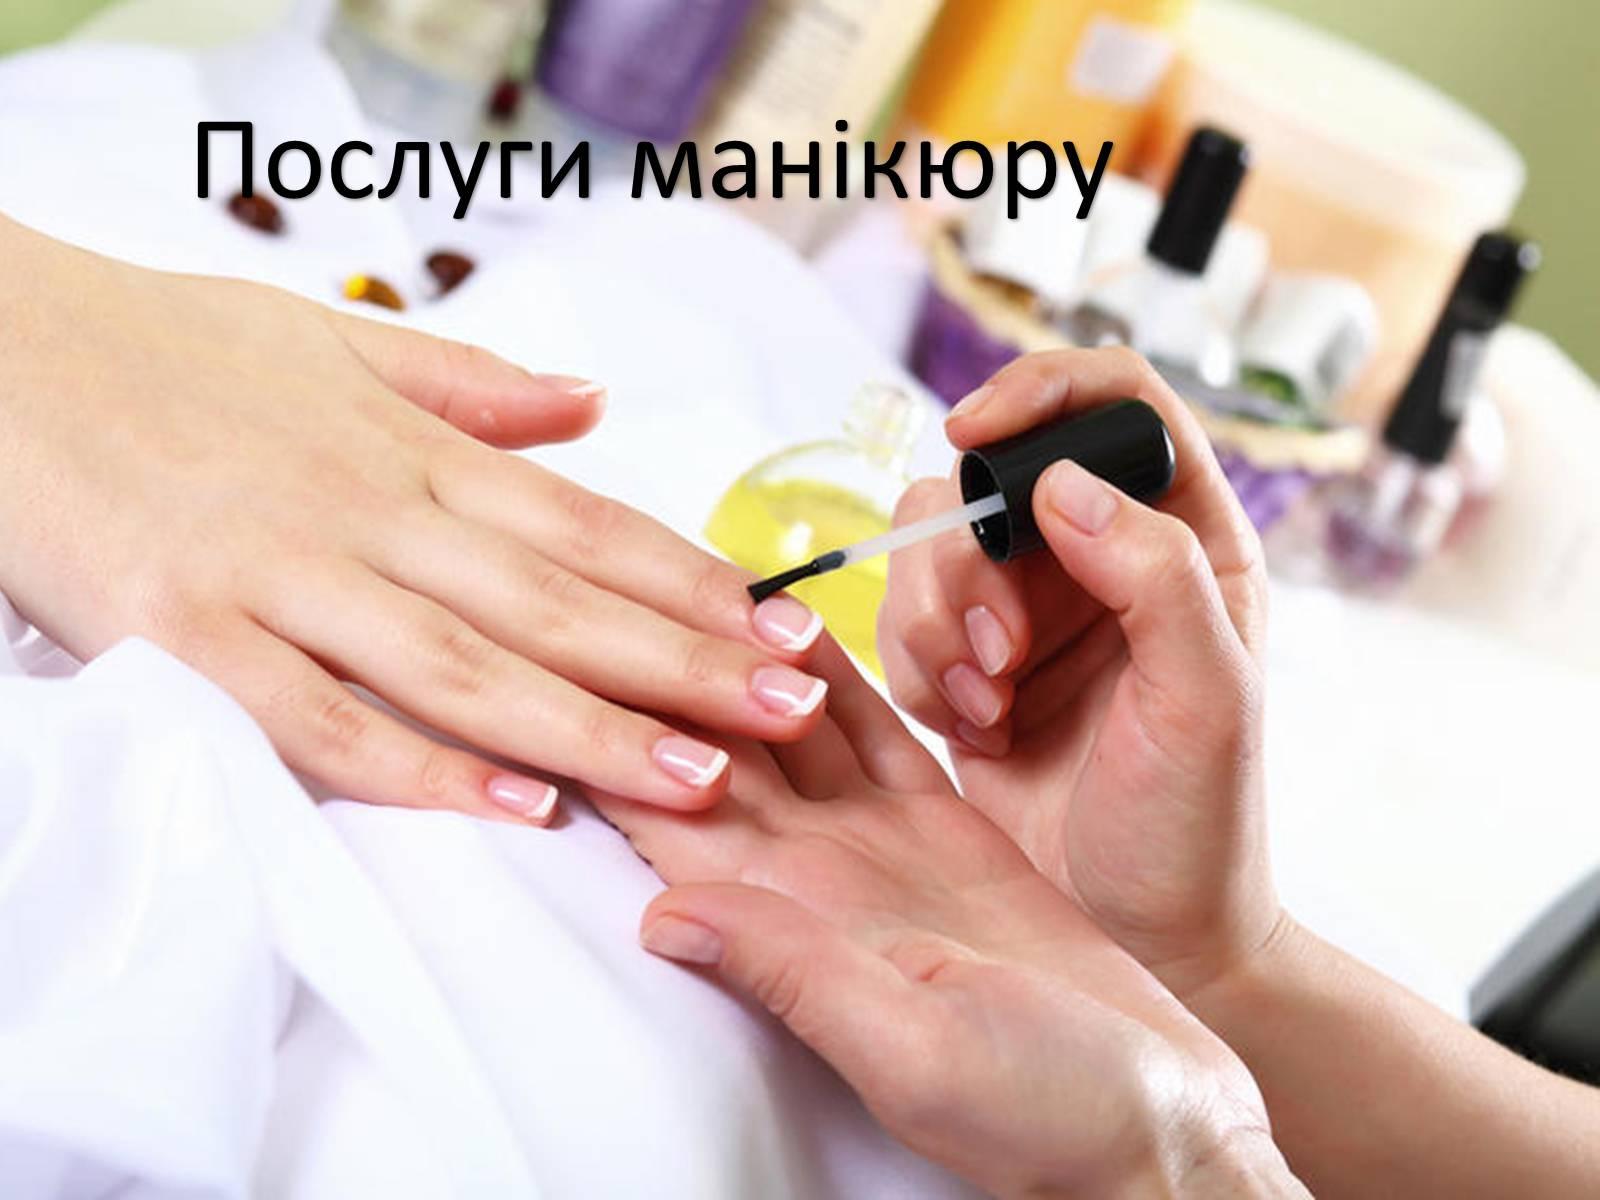 маникюр и педикюр мастер класс